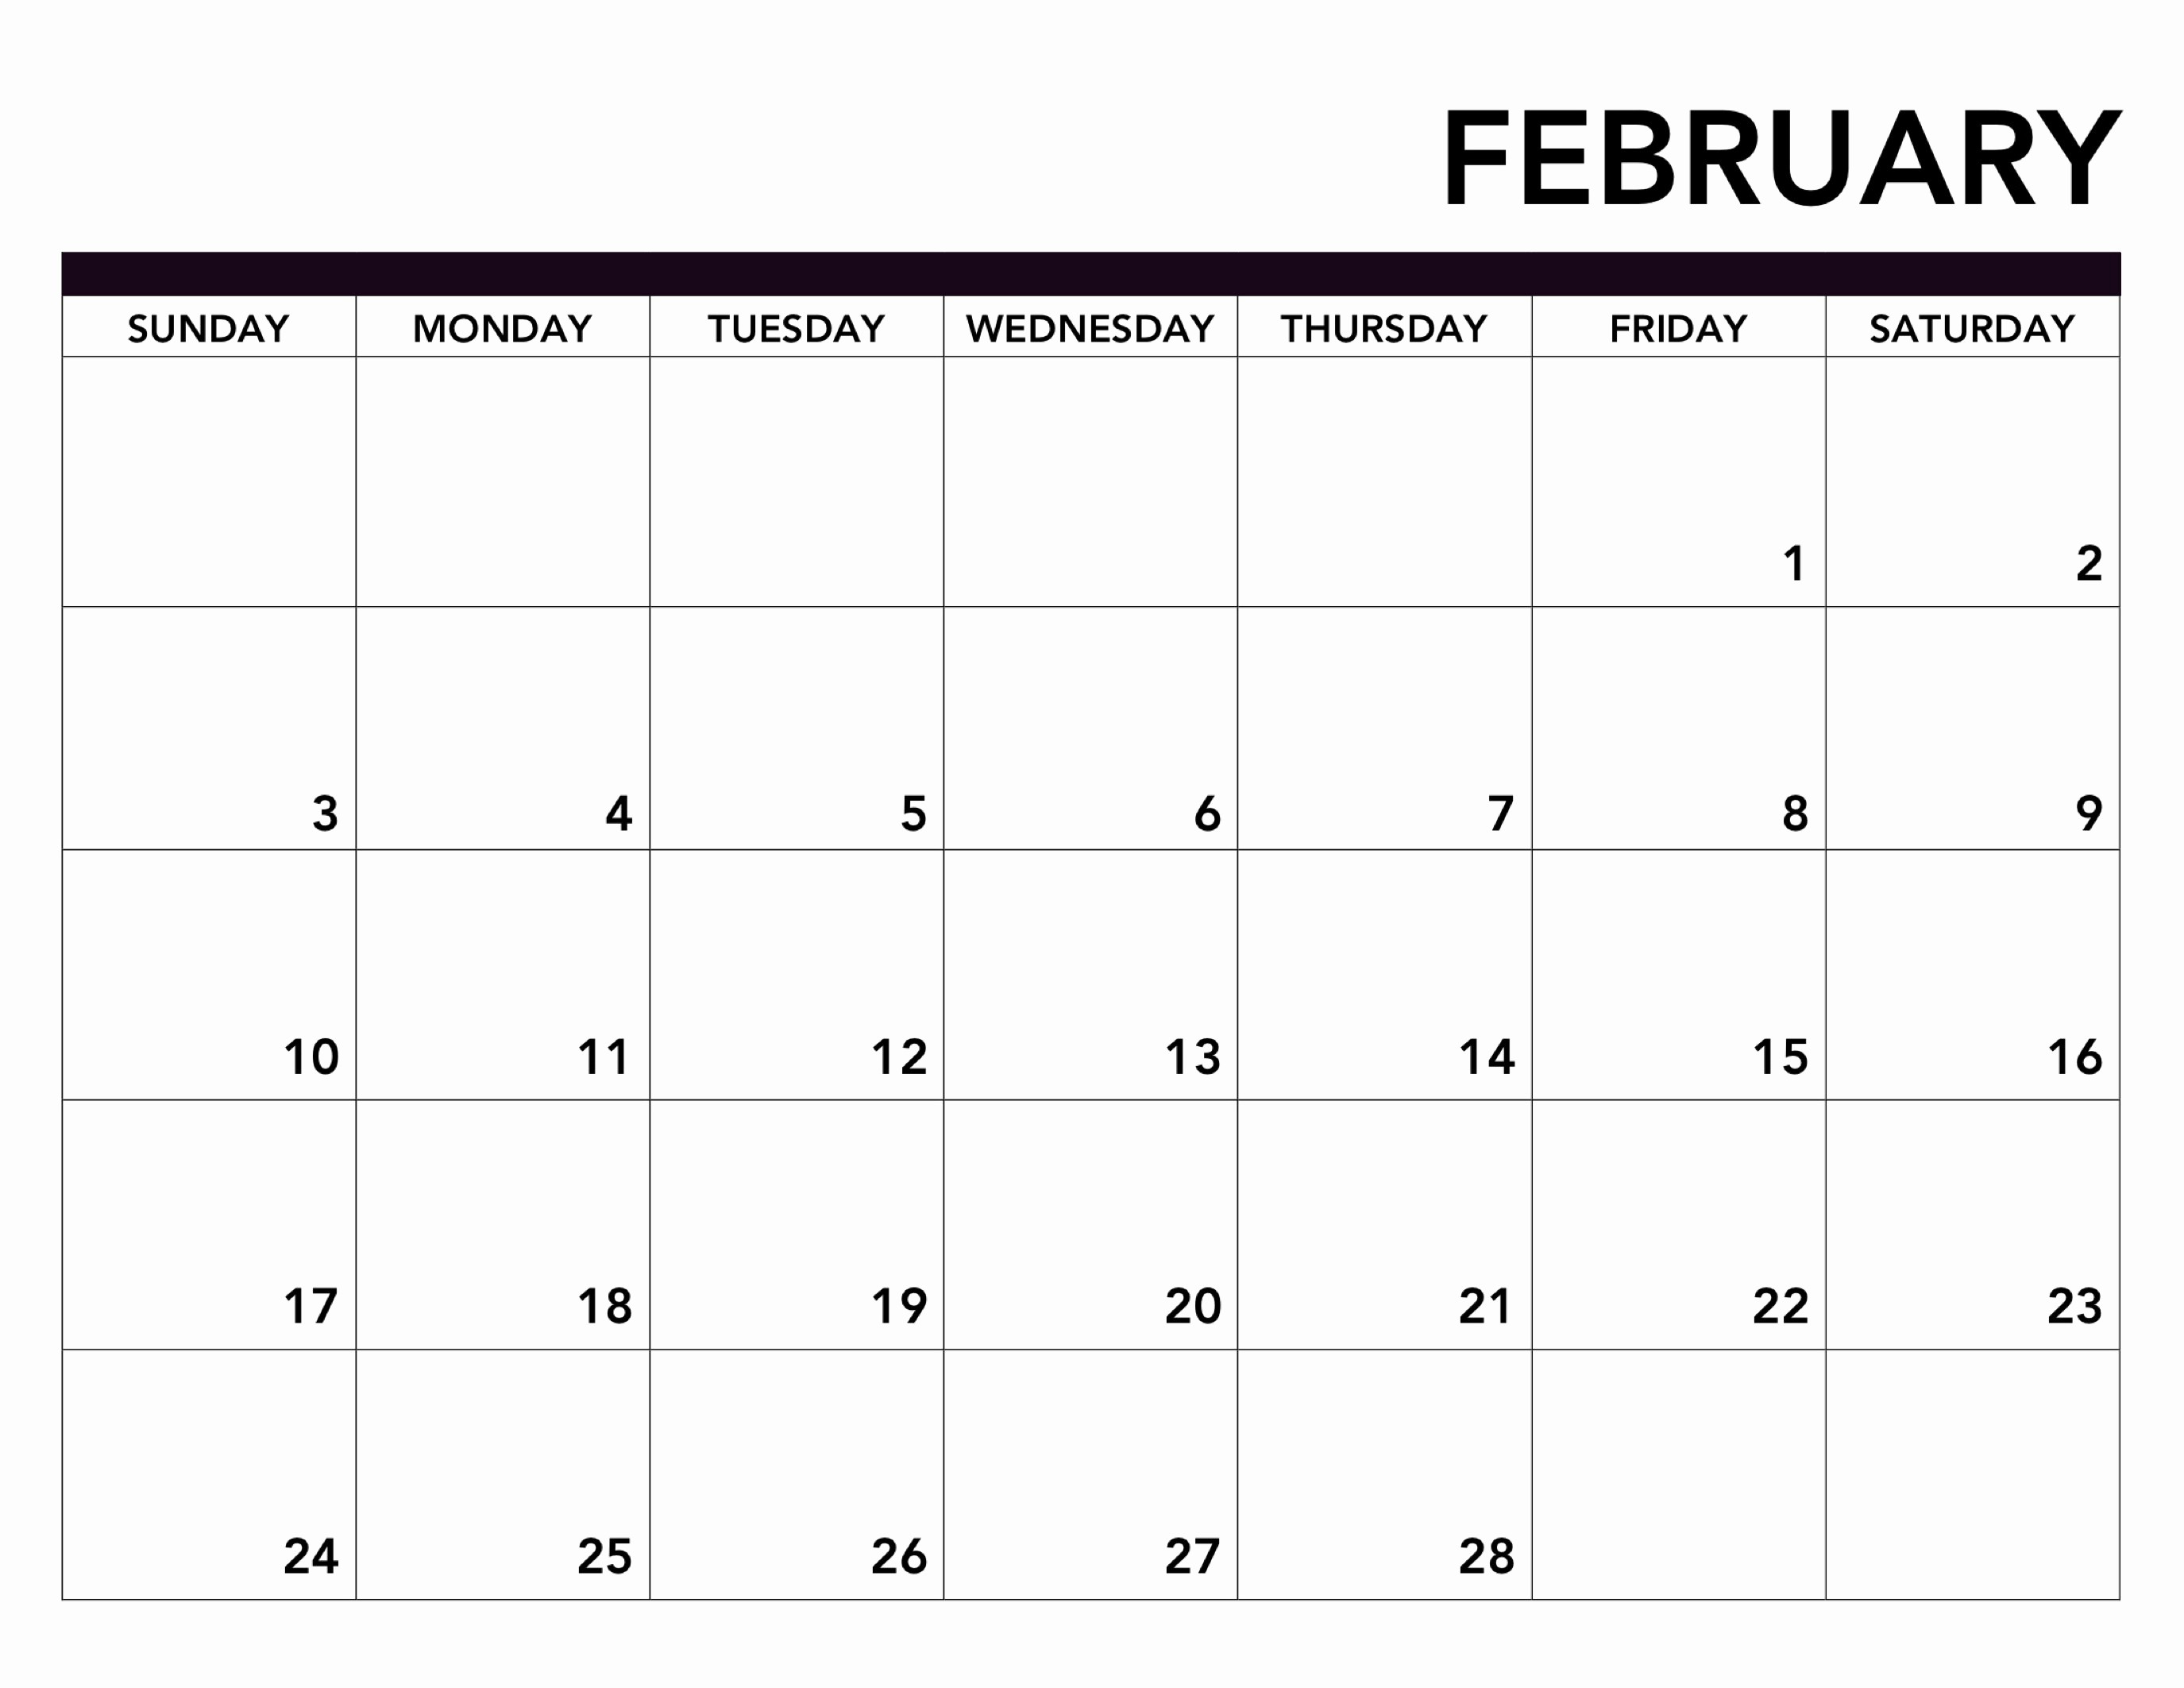 Free Printable Calendar Templates 2019 Lovely 51 Free February 2019 Printable Calendar Templates Pdf